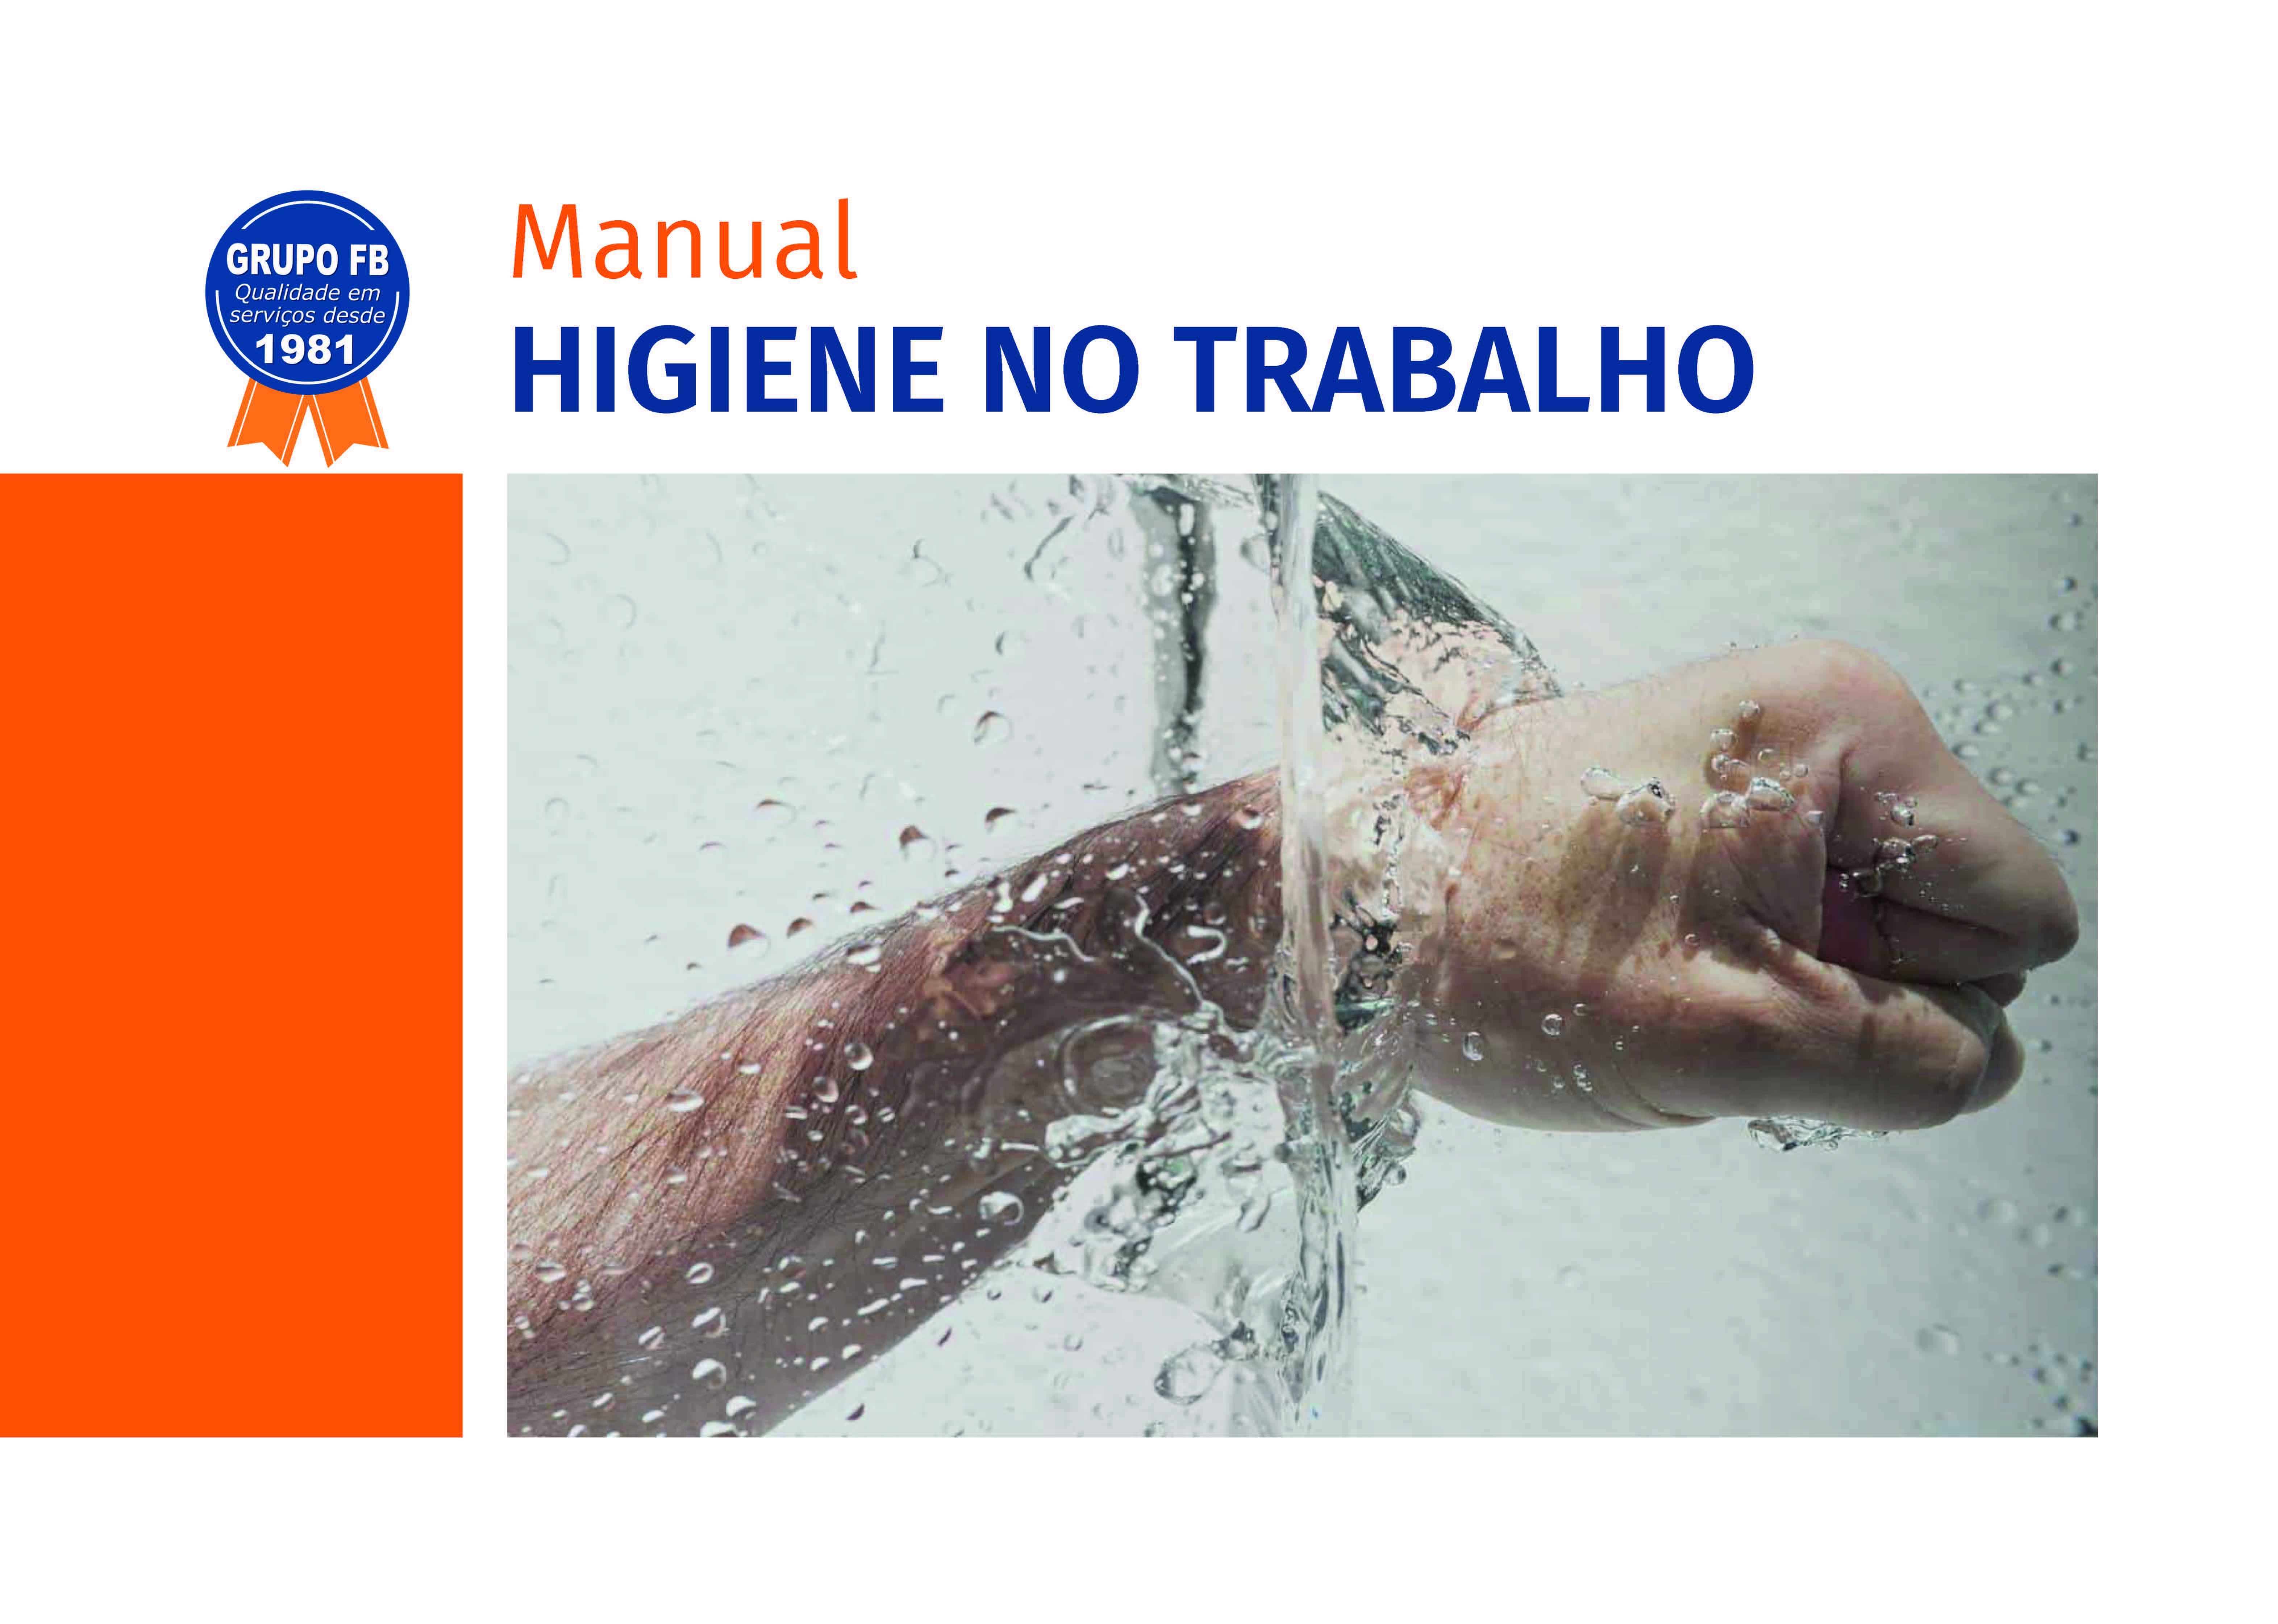 Grupo GINT. Kit de higiene pessoal